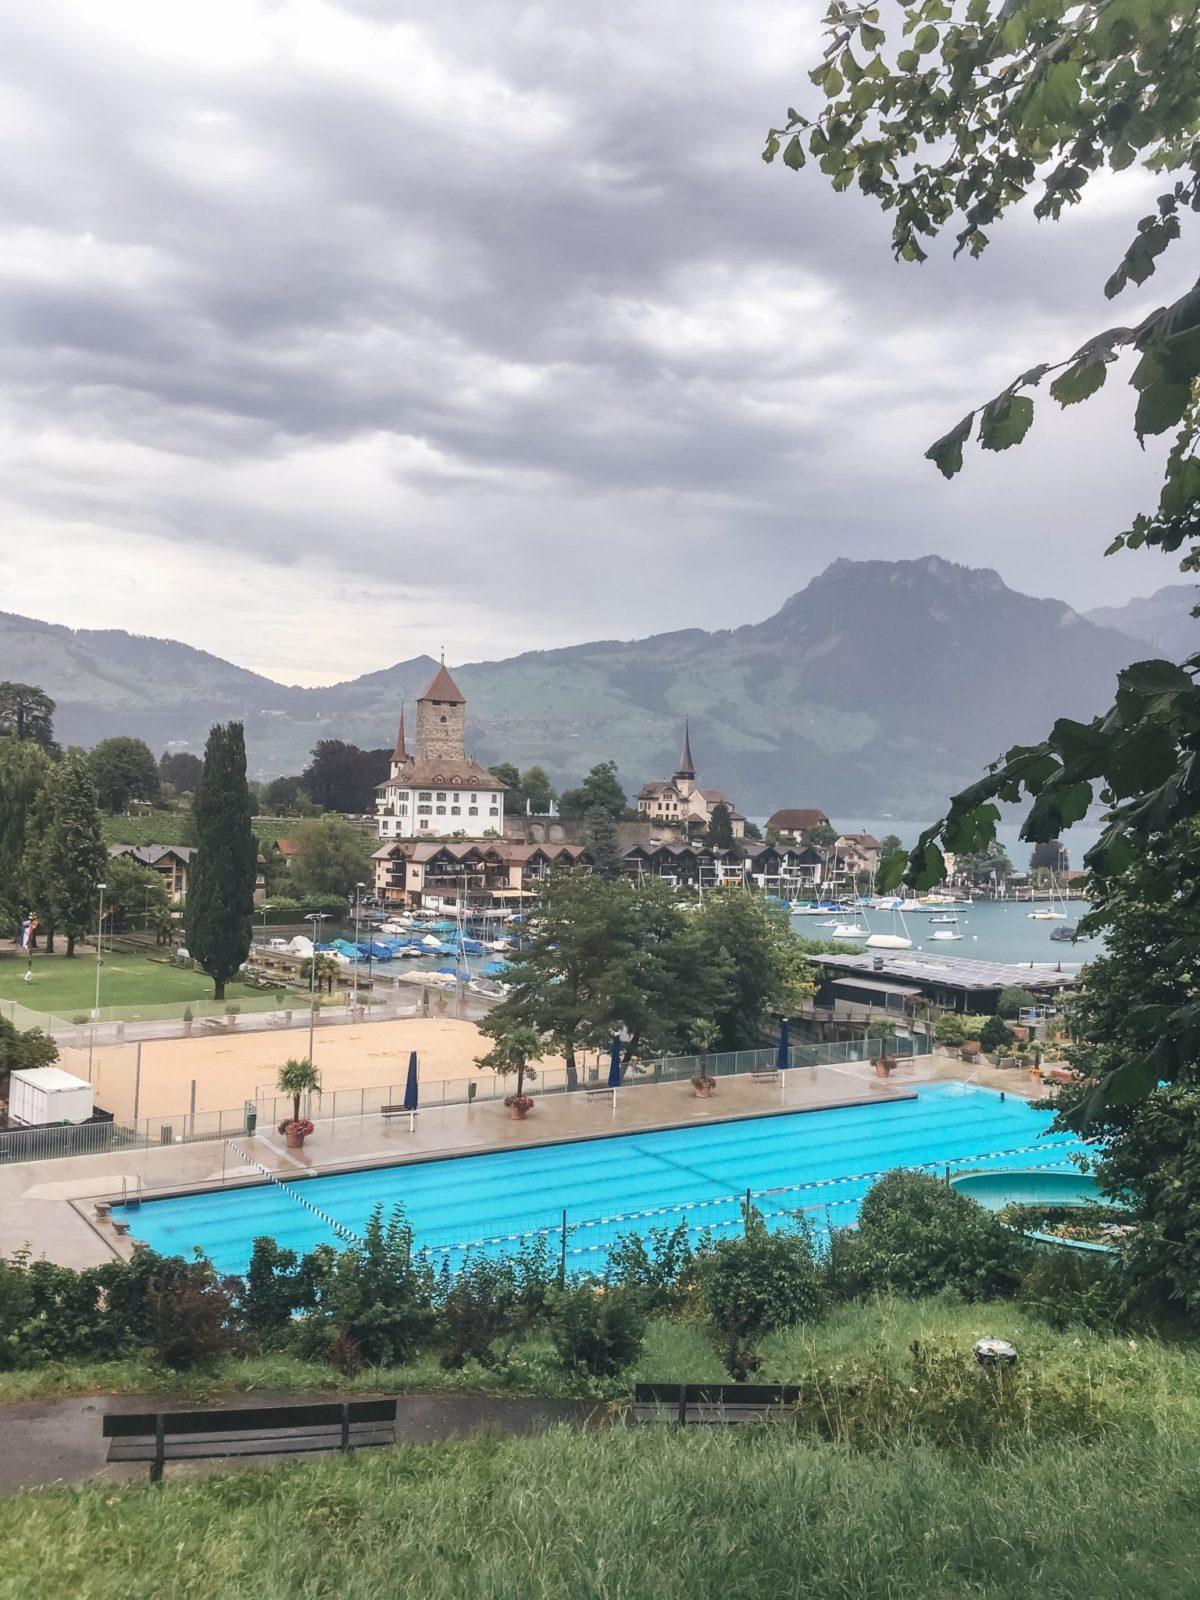 Озеро Тунн в непогоду, Швейцария